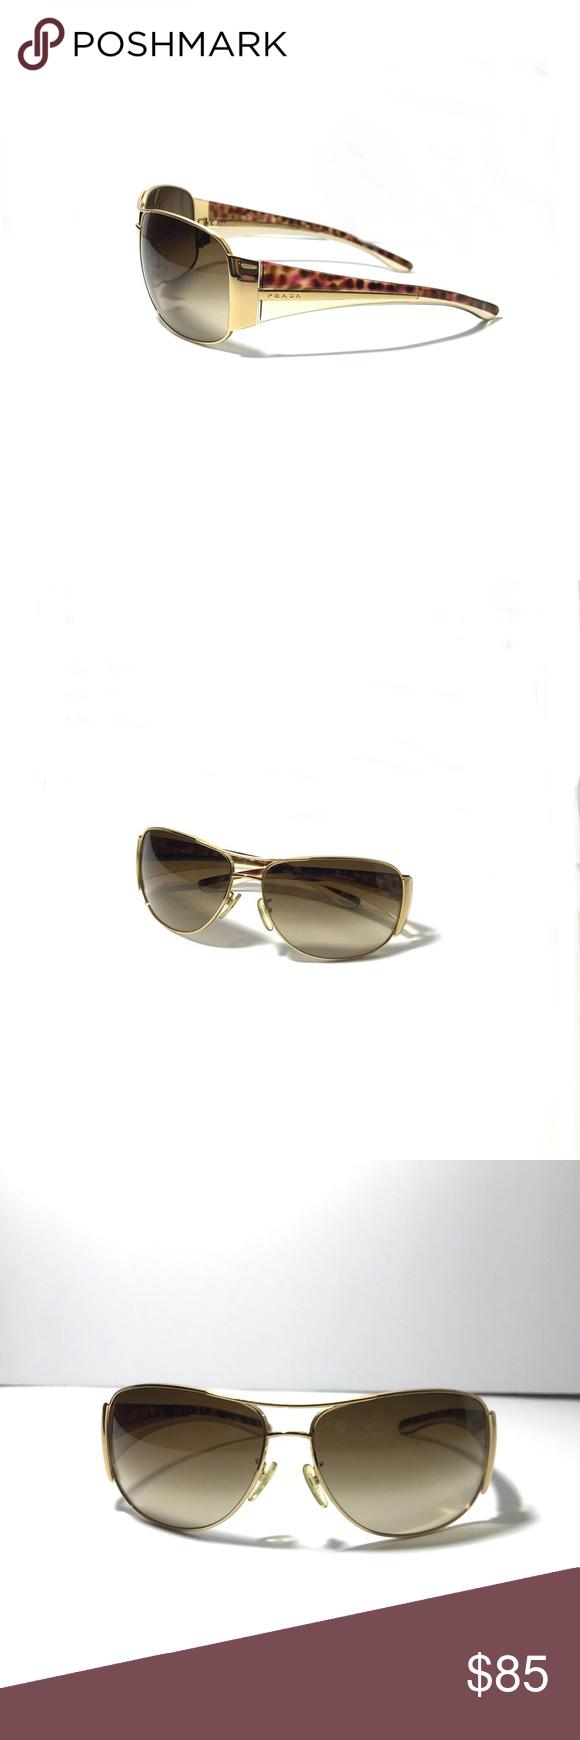 1933028262c Prada sunglasses Small scratch on the front. Still tons of life left. Prada  Accessories Sunglasses